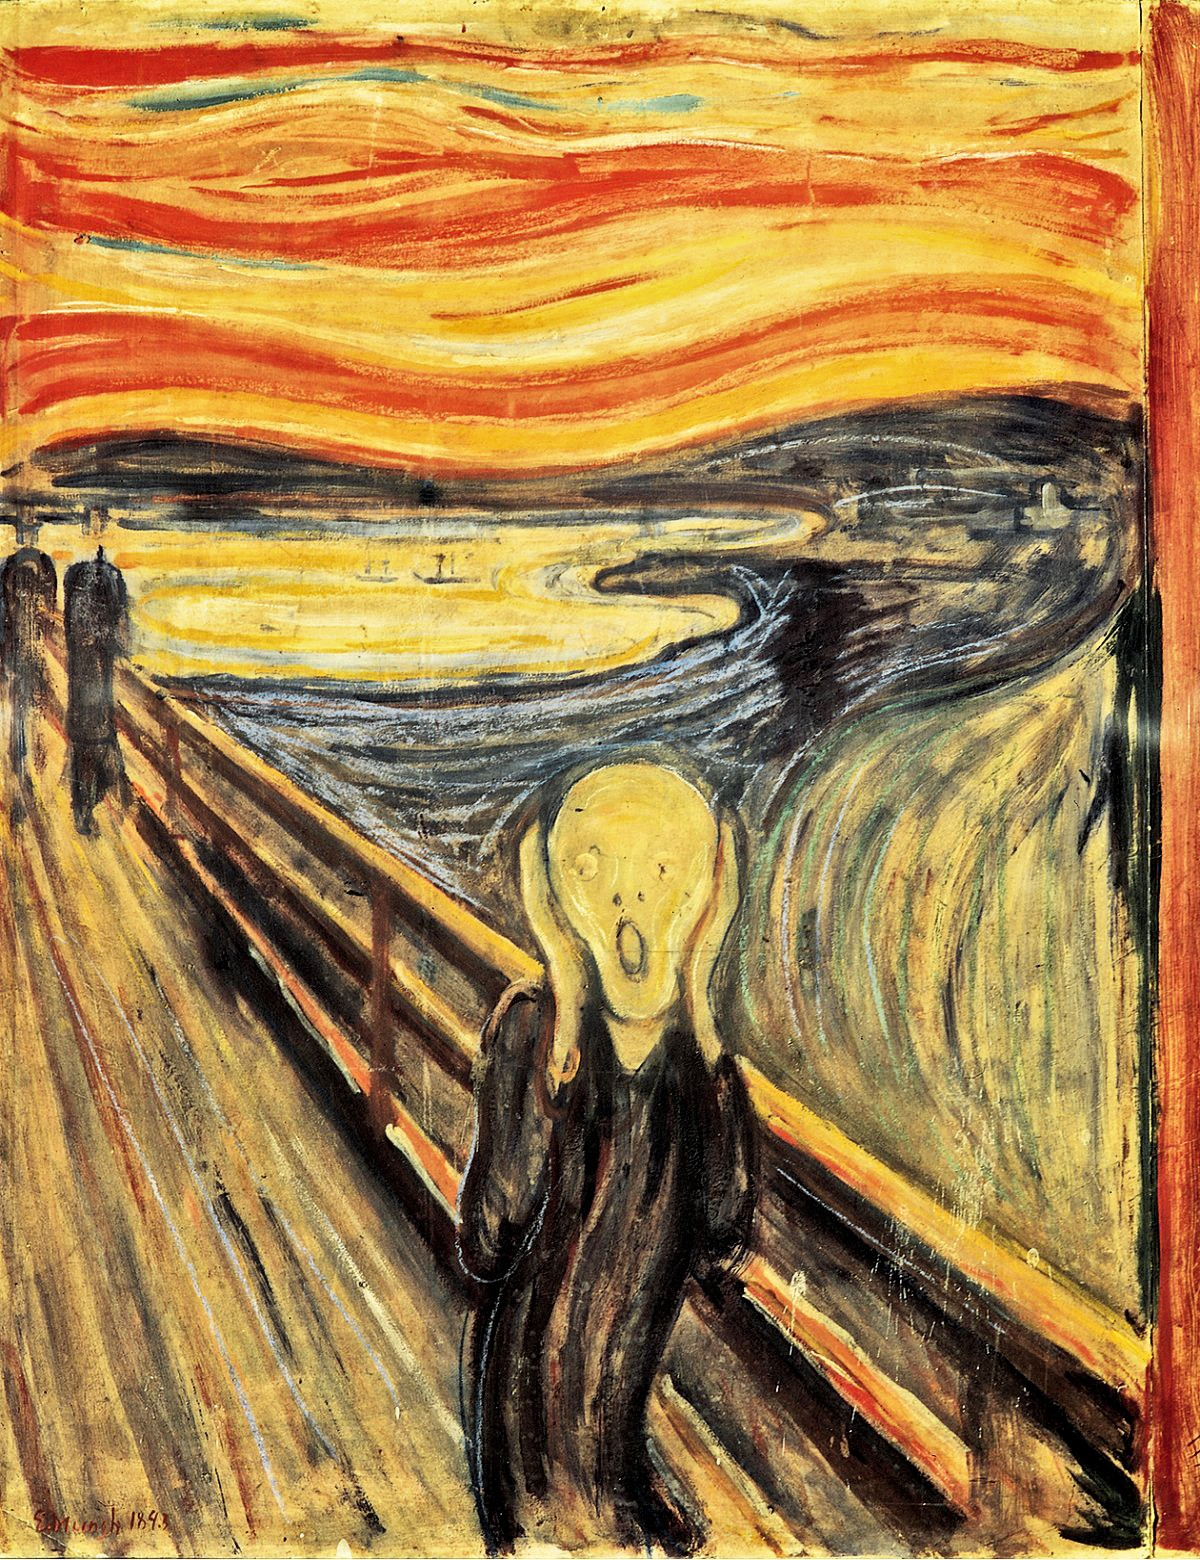 Edvard Munch, The Scream, 1893. Image Source